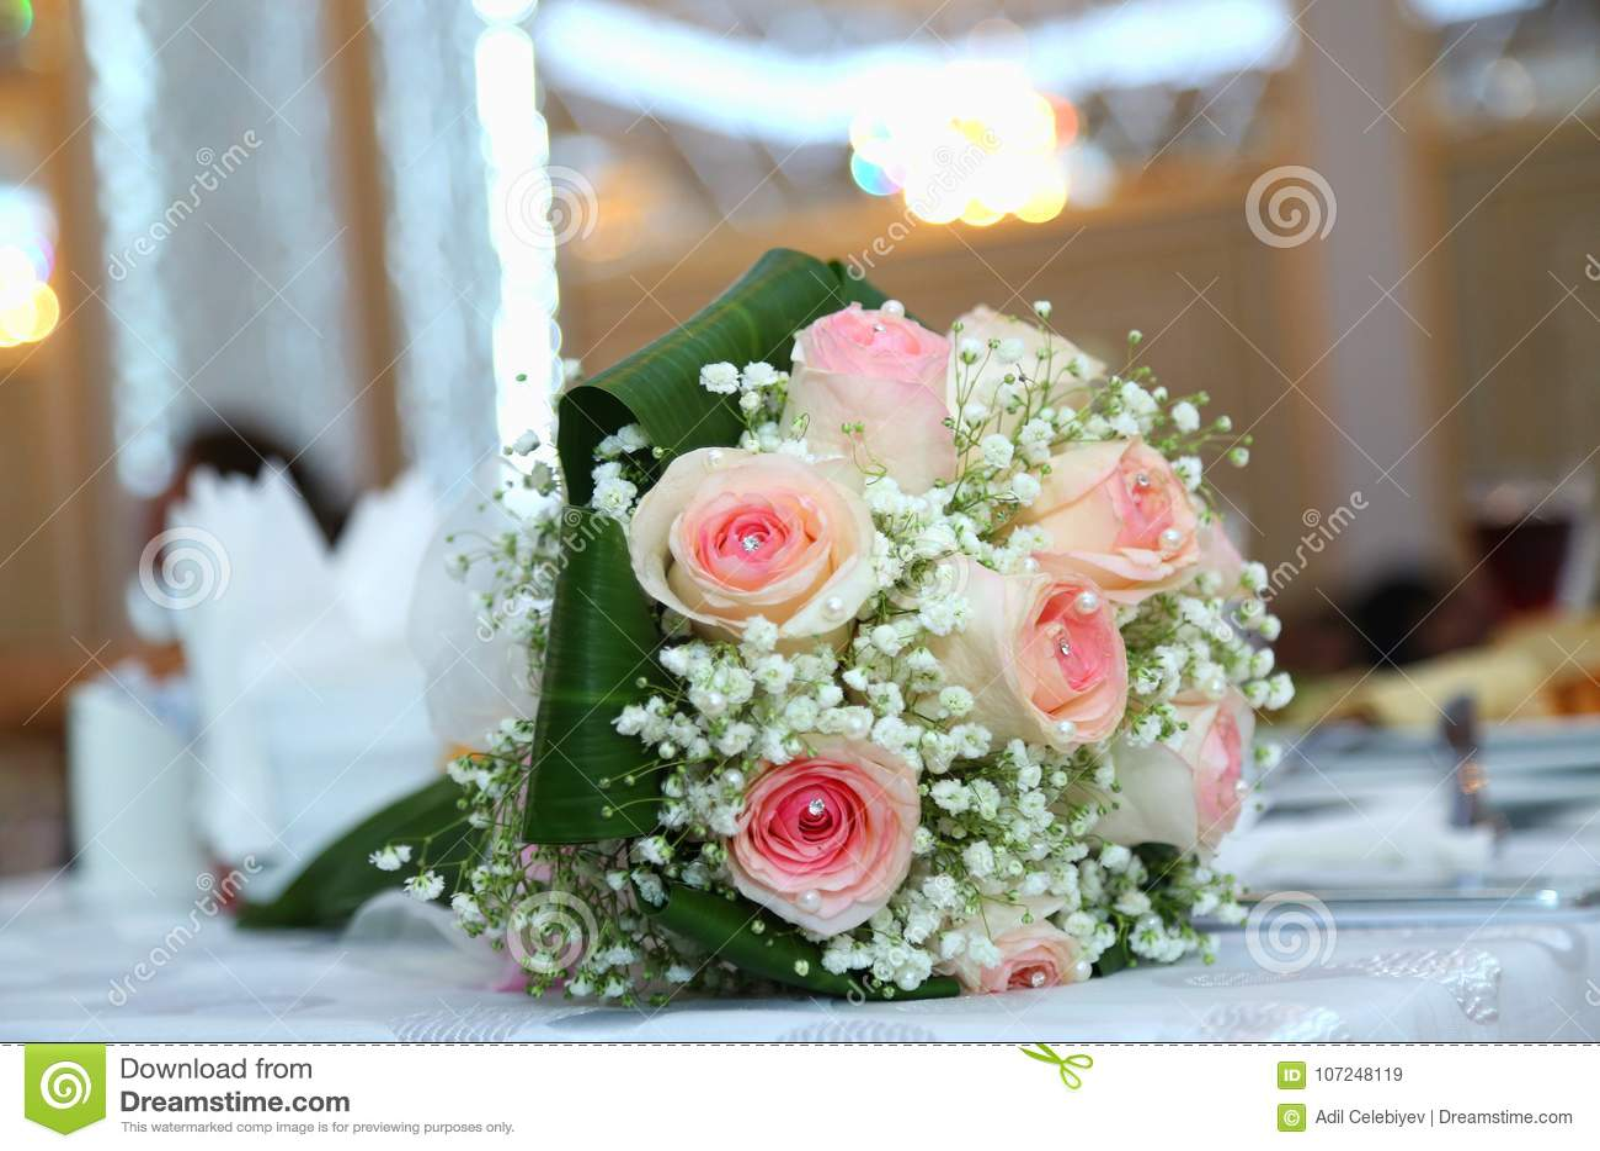 14daf4a90ff5 Άσπρη ανθοδέσμη λουλουδιών γάμου και δέσμευσης Όμορφη γαμήλια ανθοδέσμη με  τα διαφορετικά λουλούδια